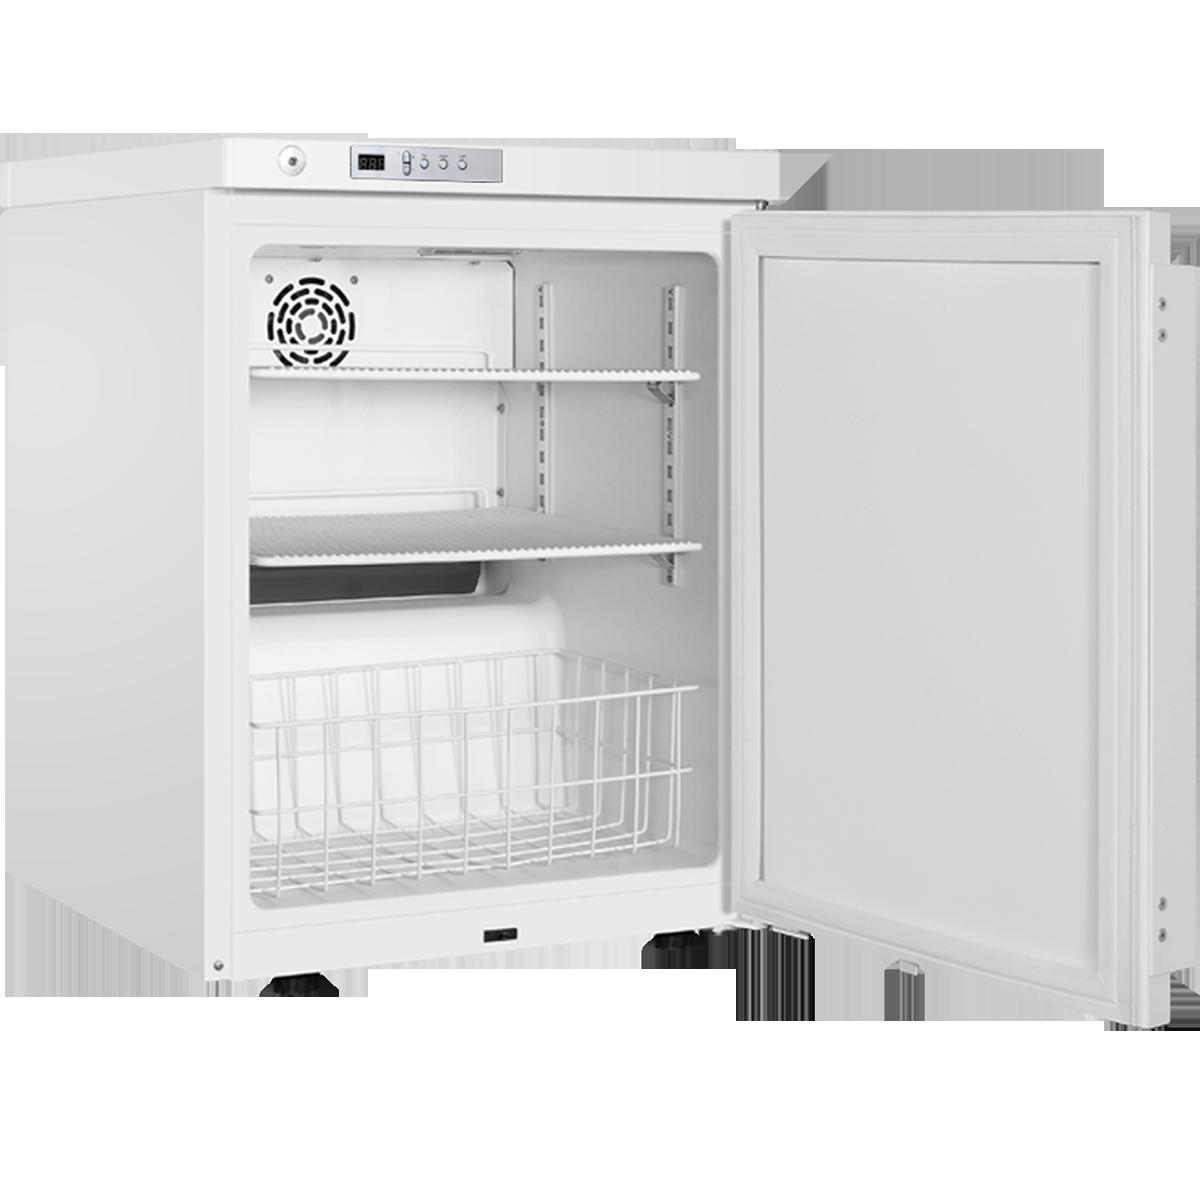 Фармацевтический  холодильник HYC-68А Haier (стеклянная дверь)